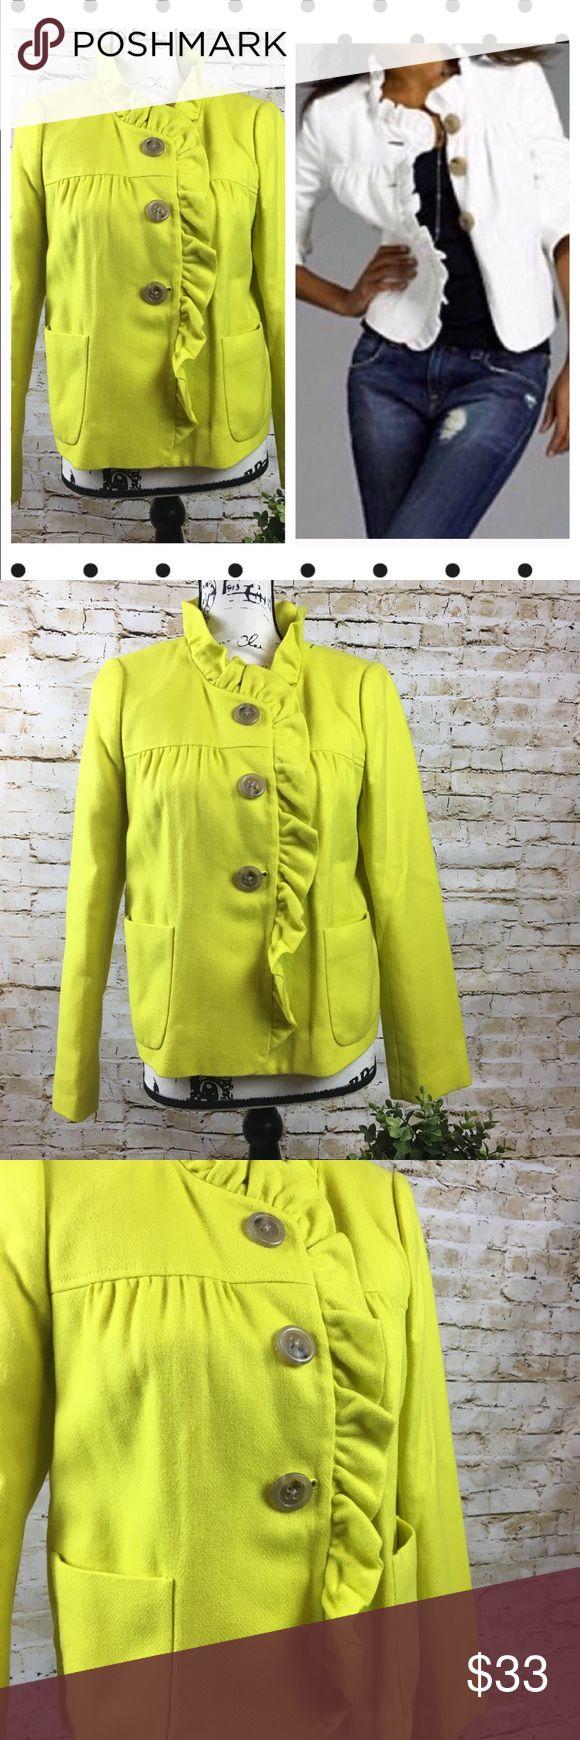 J Crew Fiona Herringbone Jacket Yellow sz 6 Like new J. Crew Jackets & Coats Blazers